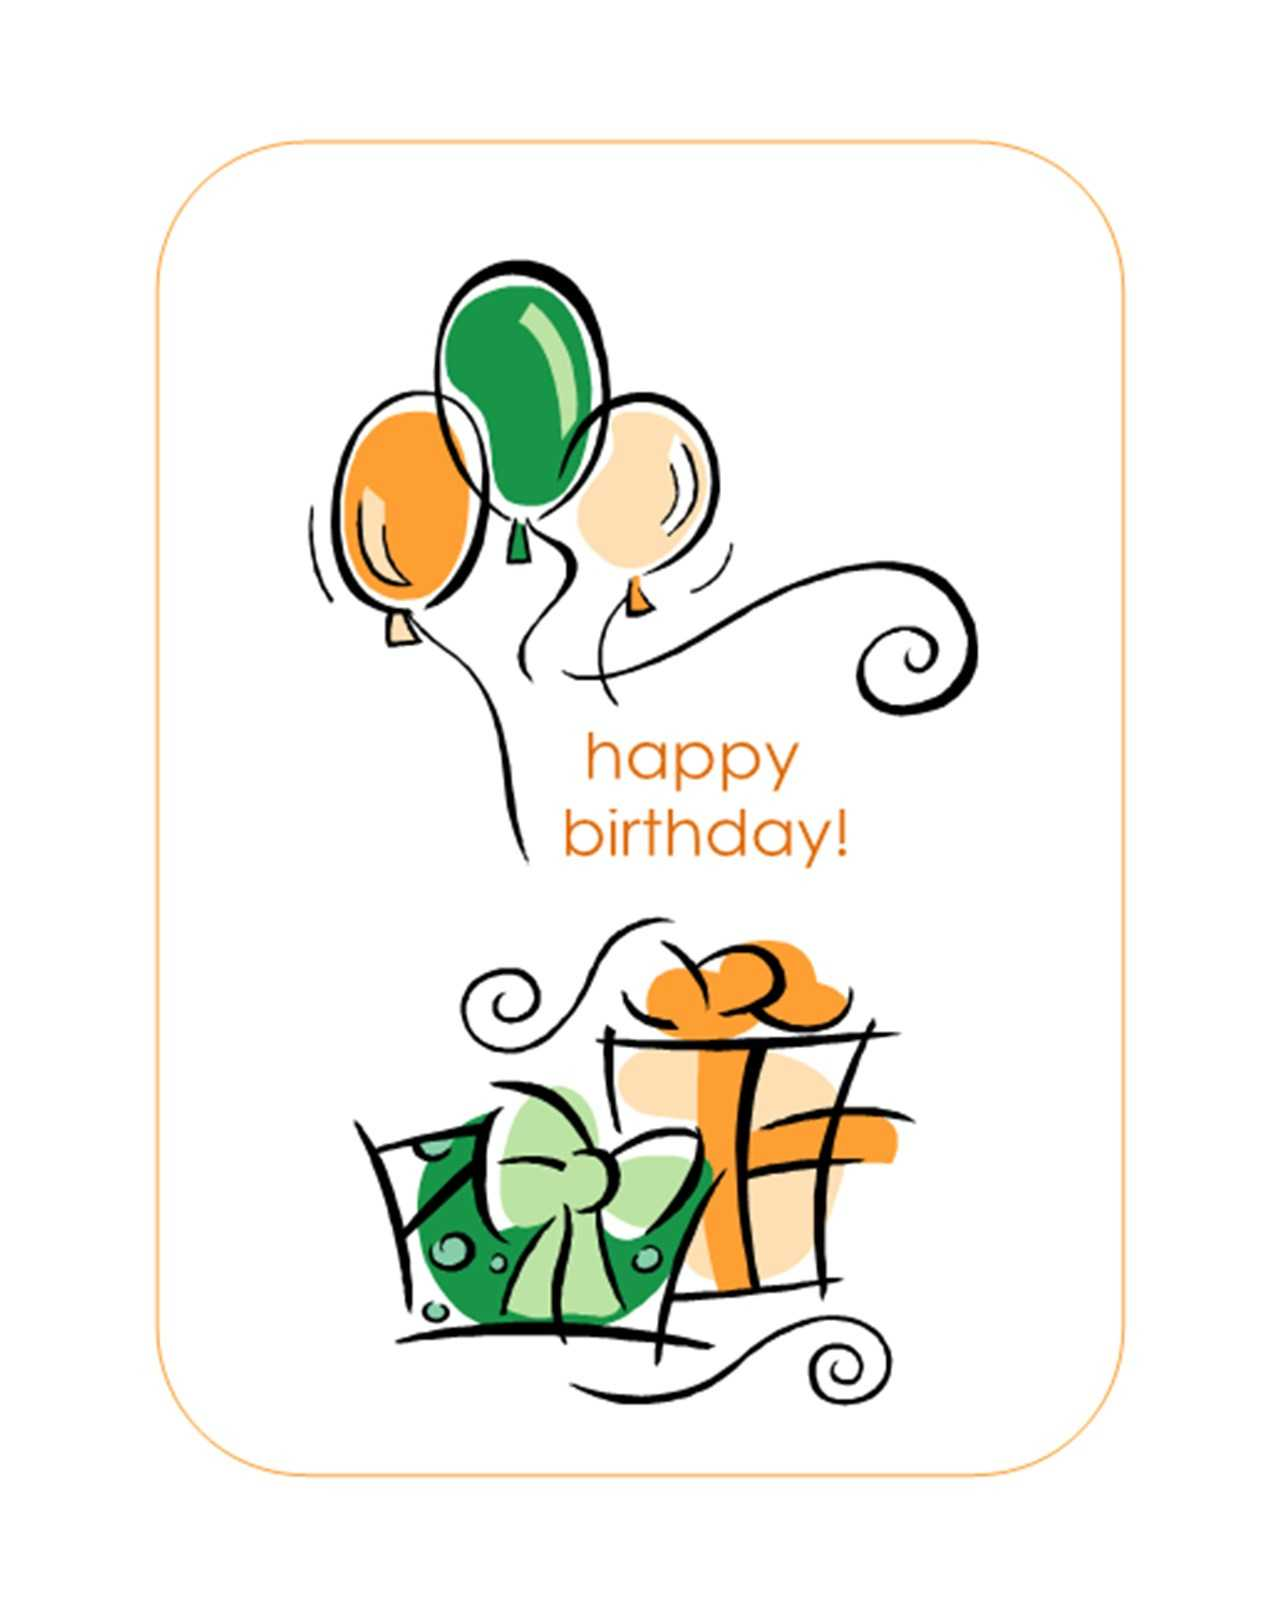 Quarter Fold Birthday Card Template - Atlantaauctionco For Quarter Fold Birthday Card Template